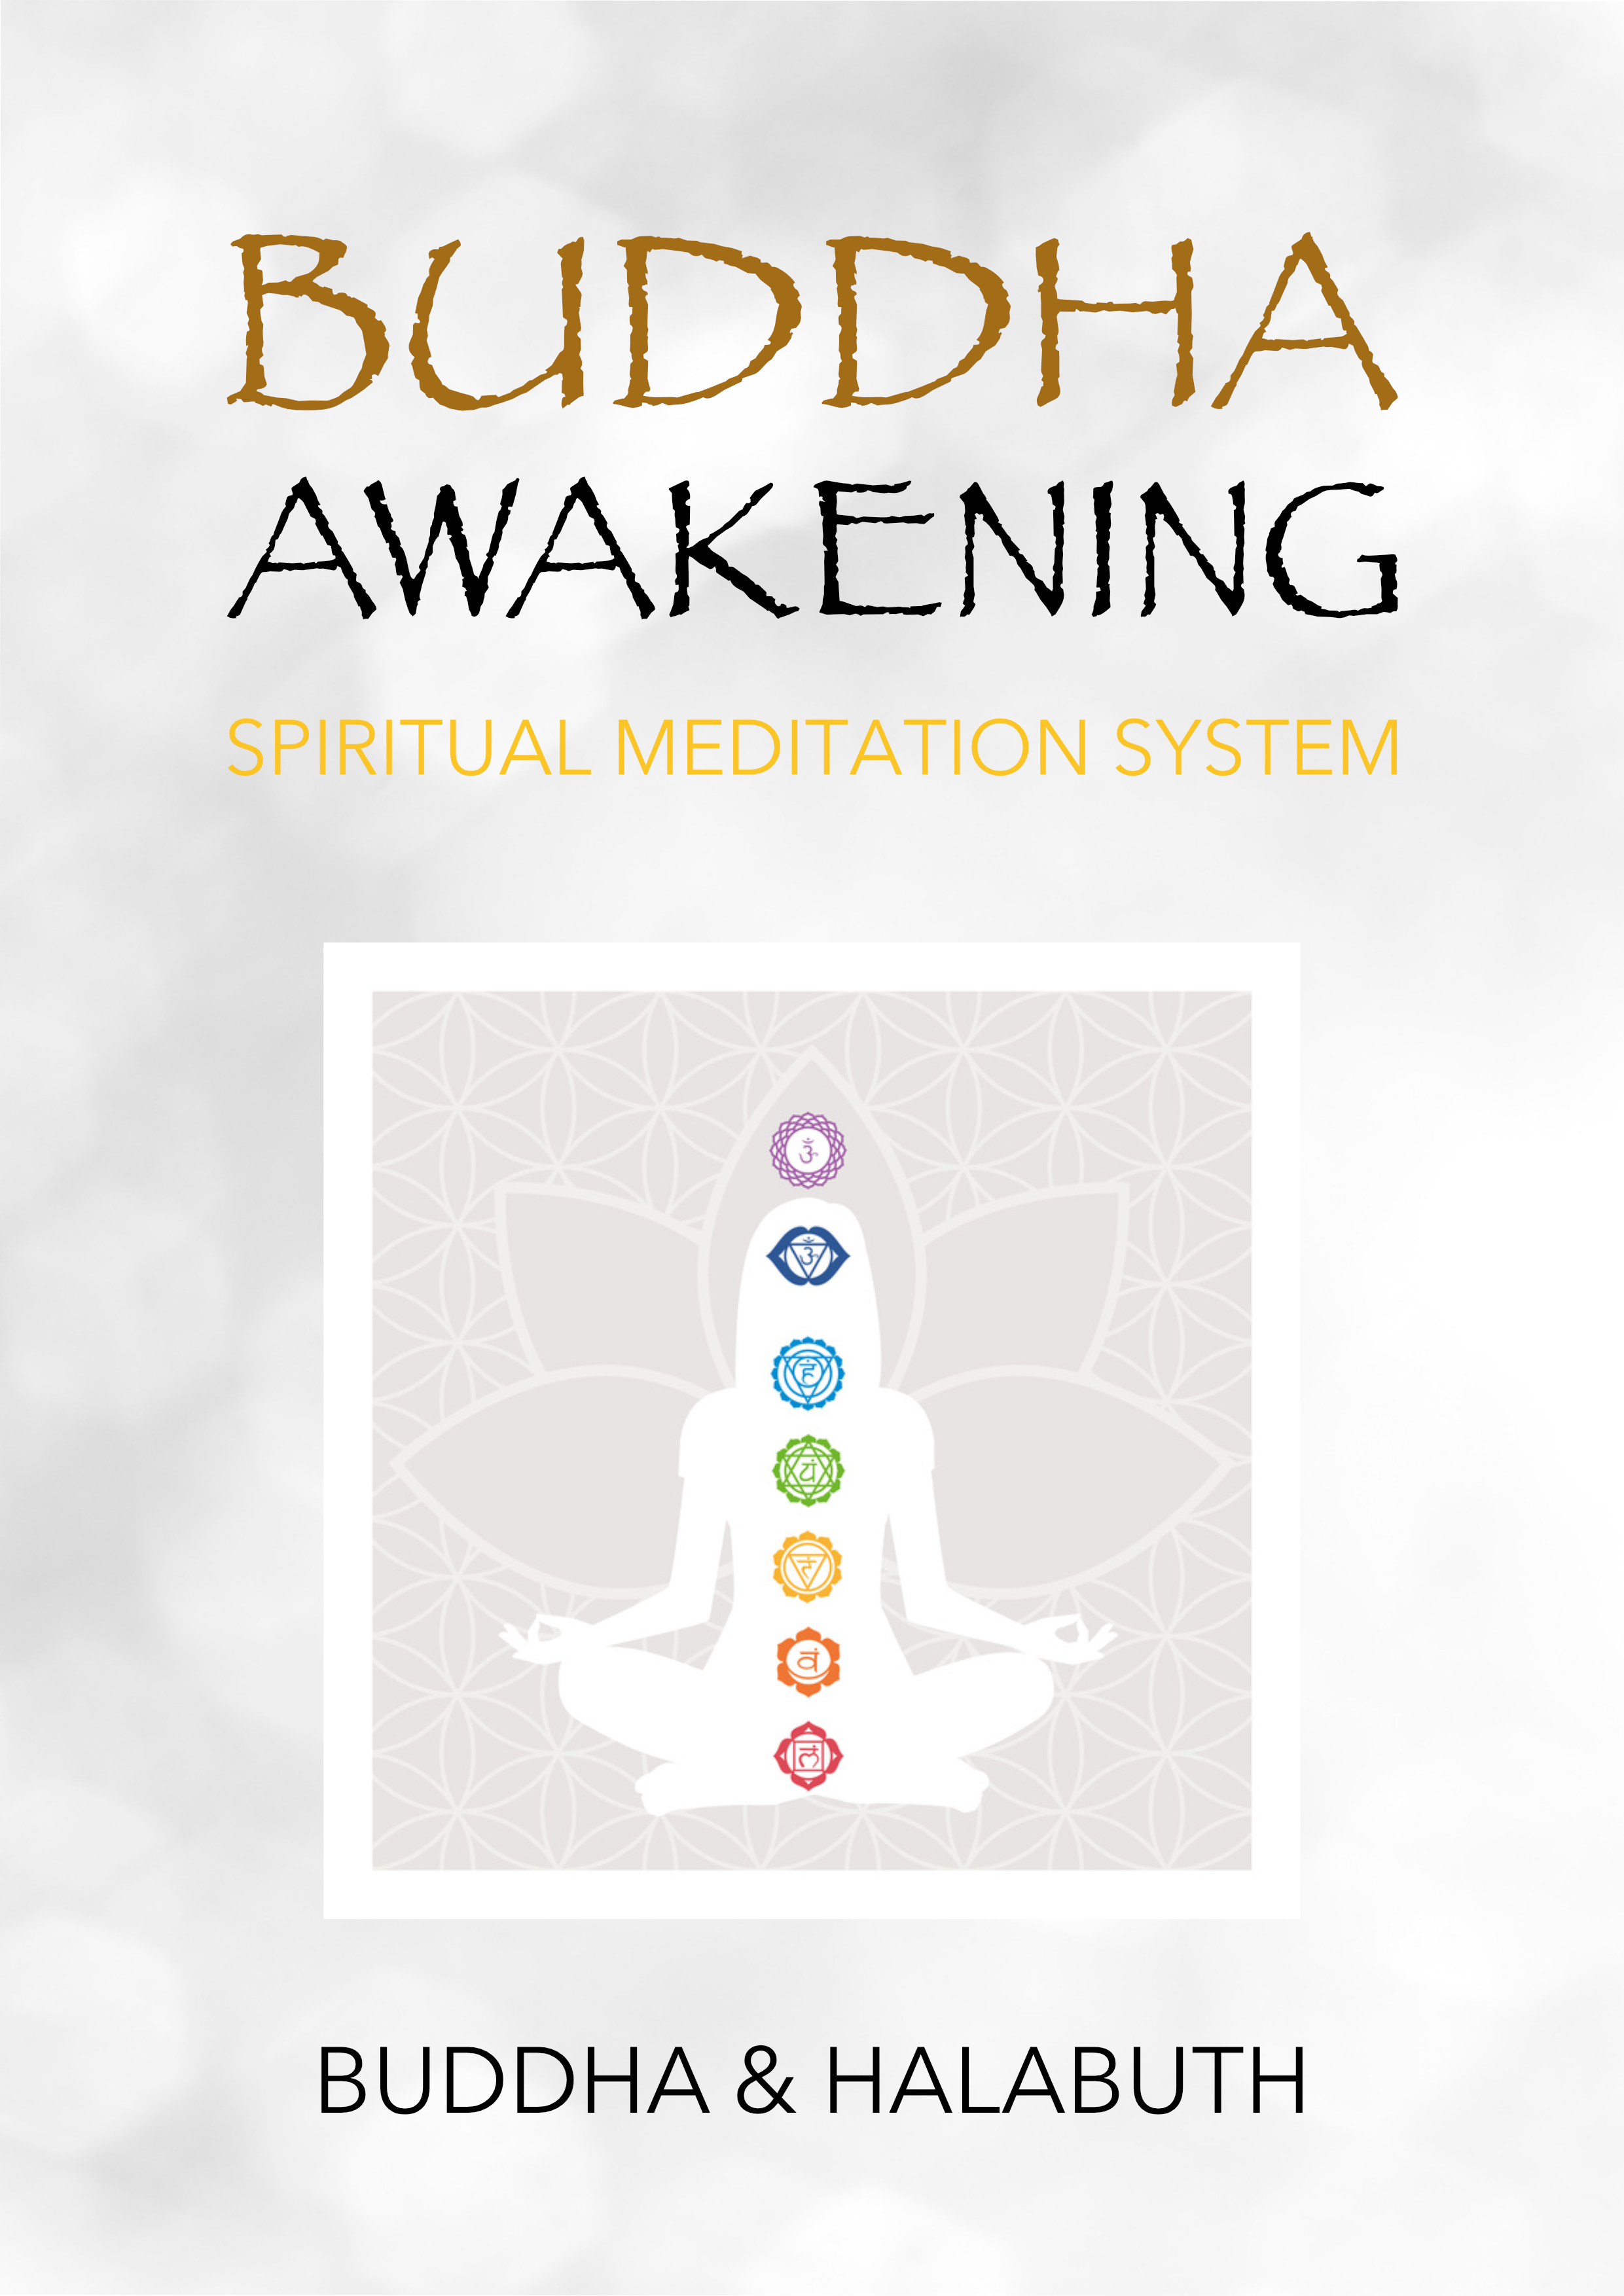 Buddha Awakening Psychic Training